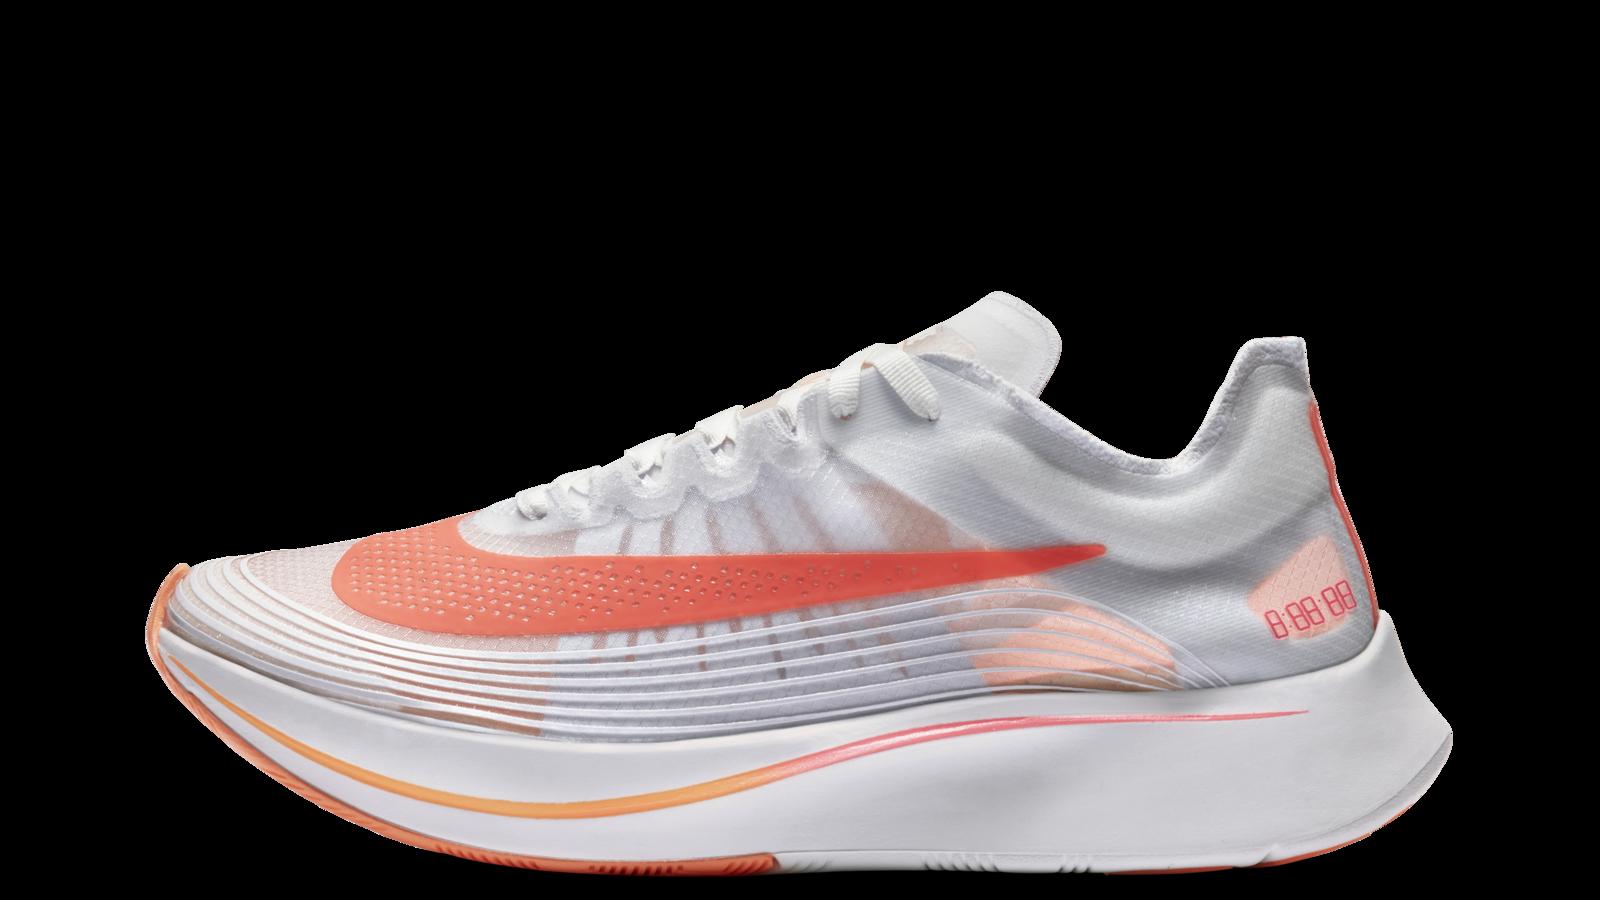 Sepatu Nike Zoom Fly SP City Pack 2018 - Sepatu Lari Nike Terbaru Maraton - Info Rilis & Harga